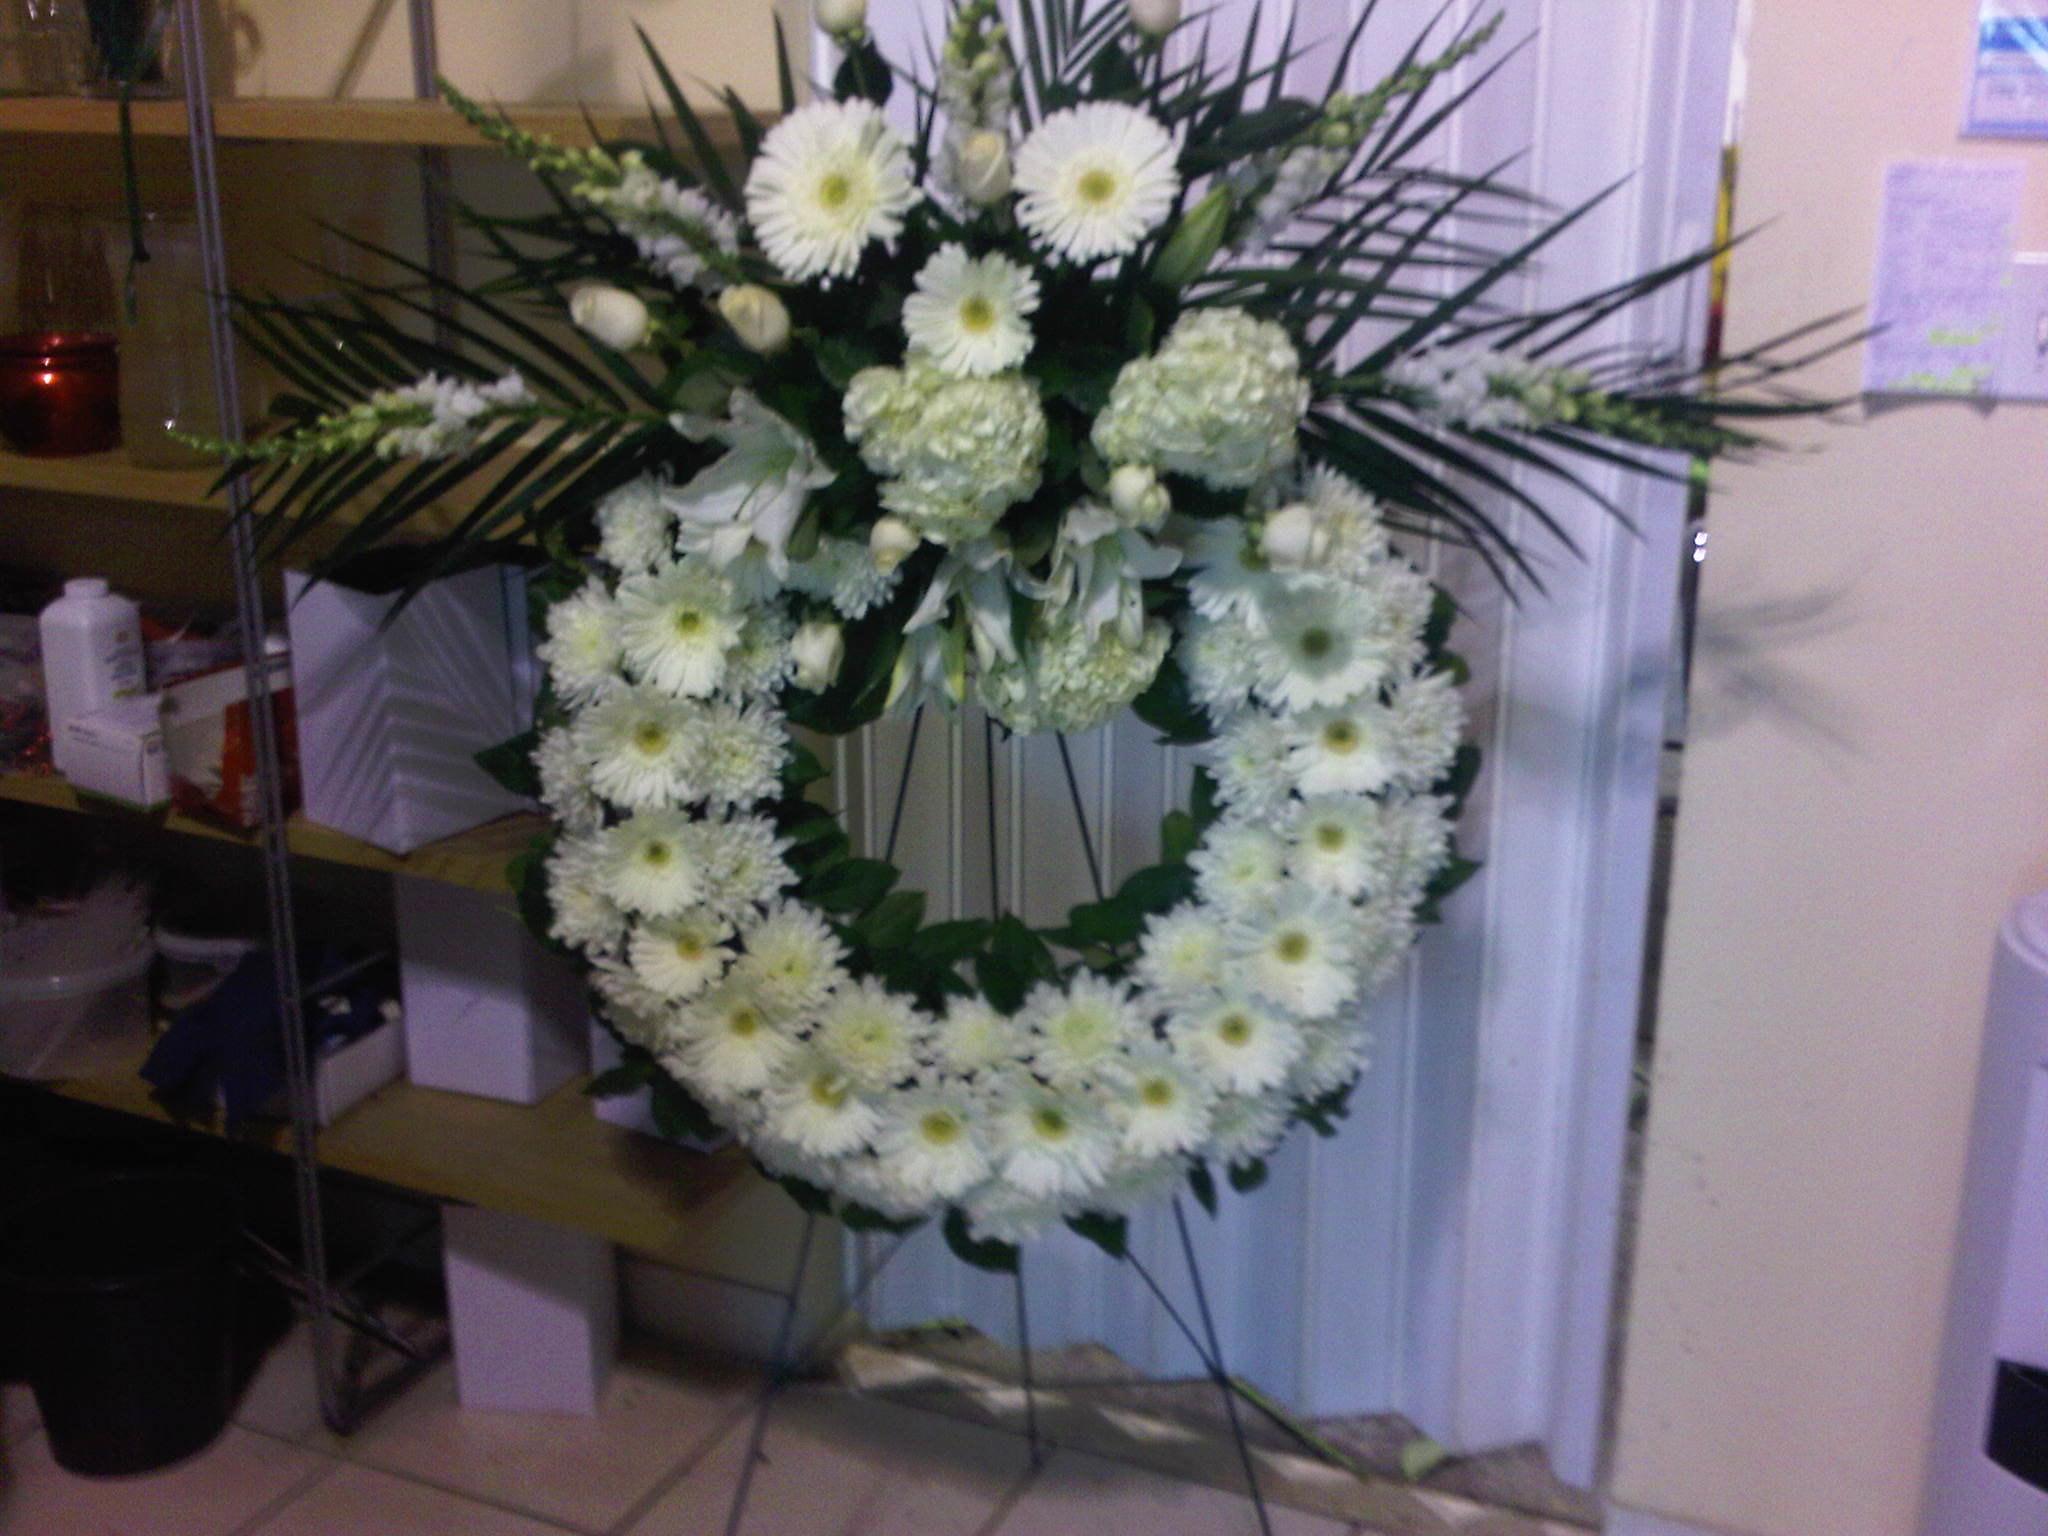 Farah florist. F-WR-5.         $400-$450